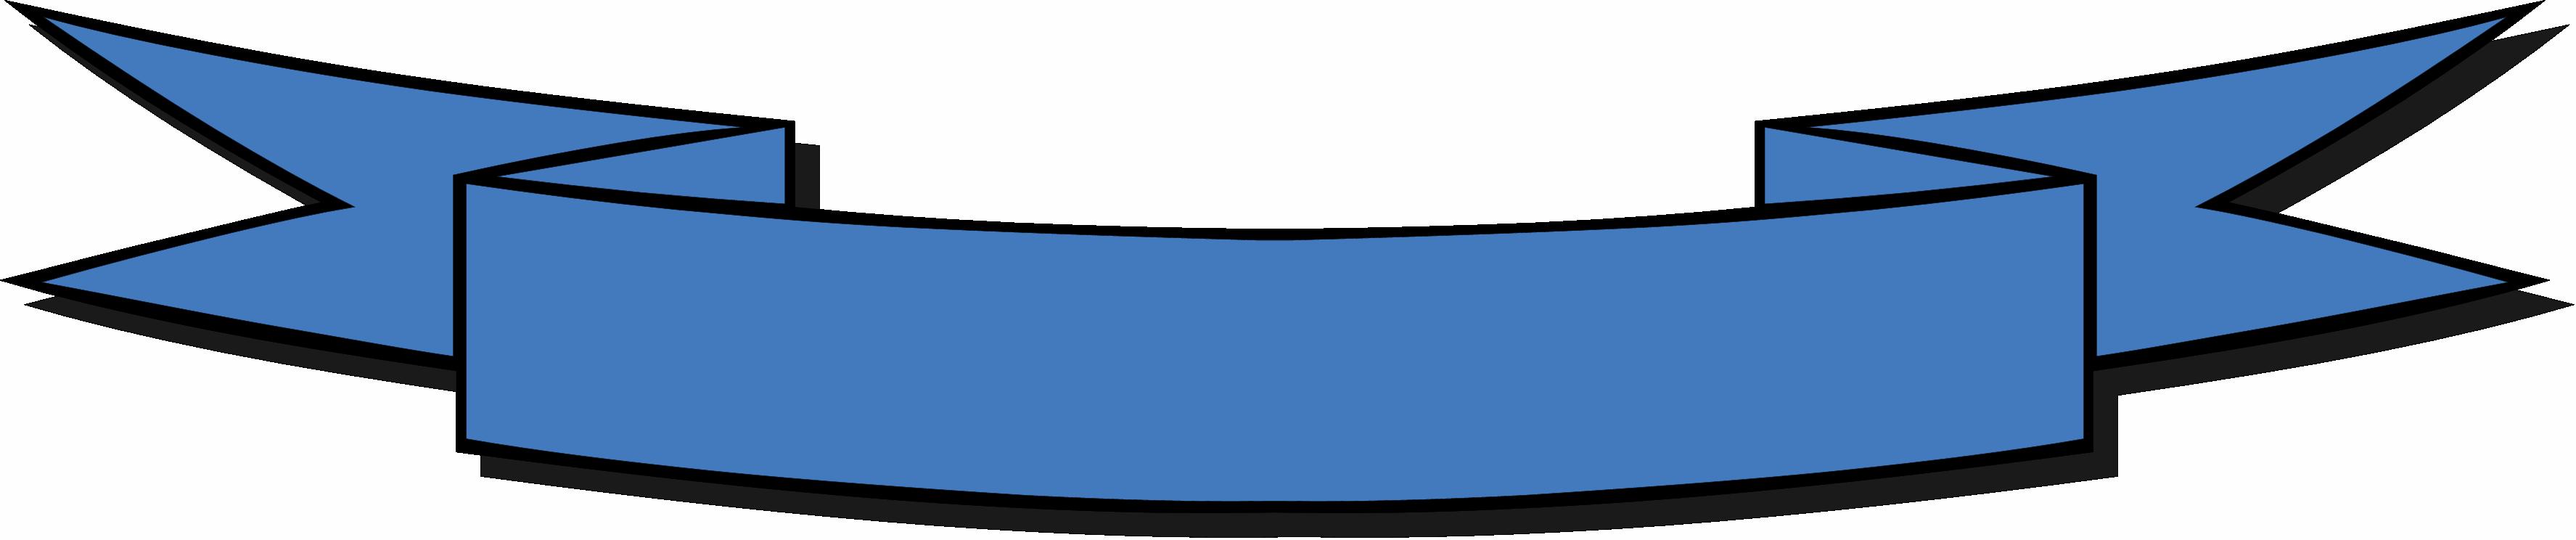 Logo ribbon clipart png graphic transparent BLANK RIBBON PNG - ClipArt Best graphic transparent